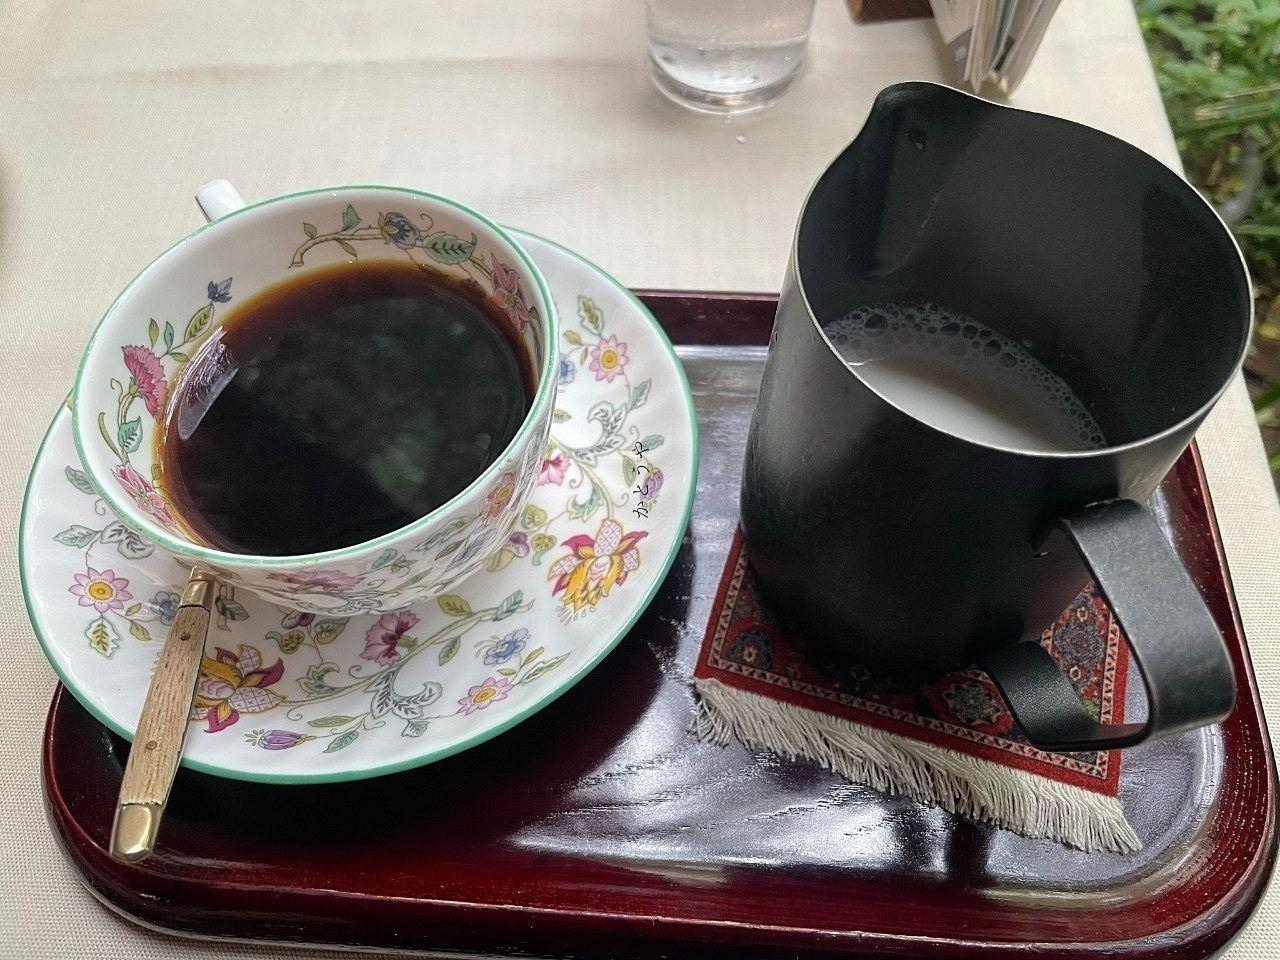 SAZAコーヒーの澁澤栄一仏蘭西物語をいただきました!